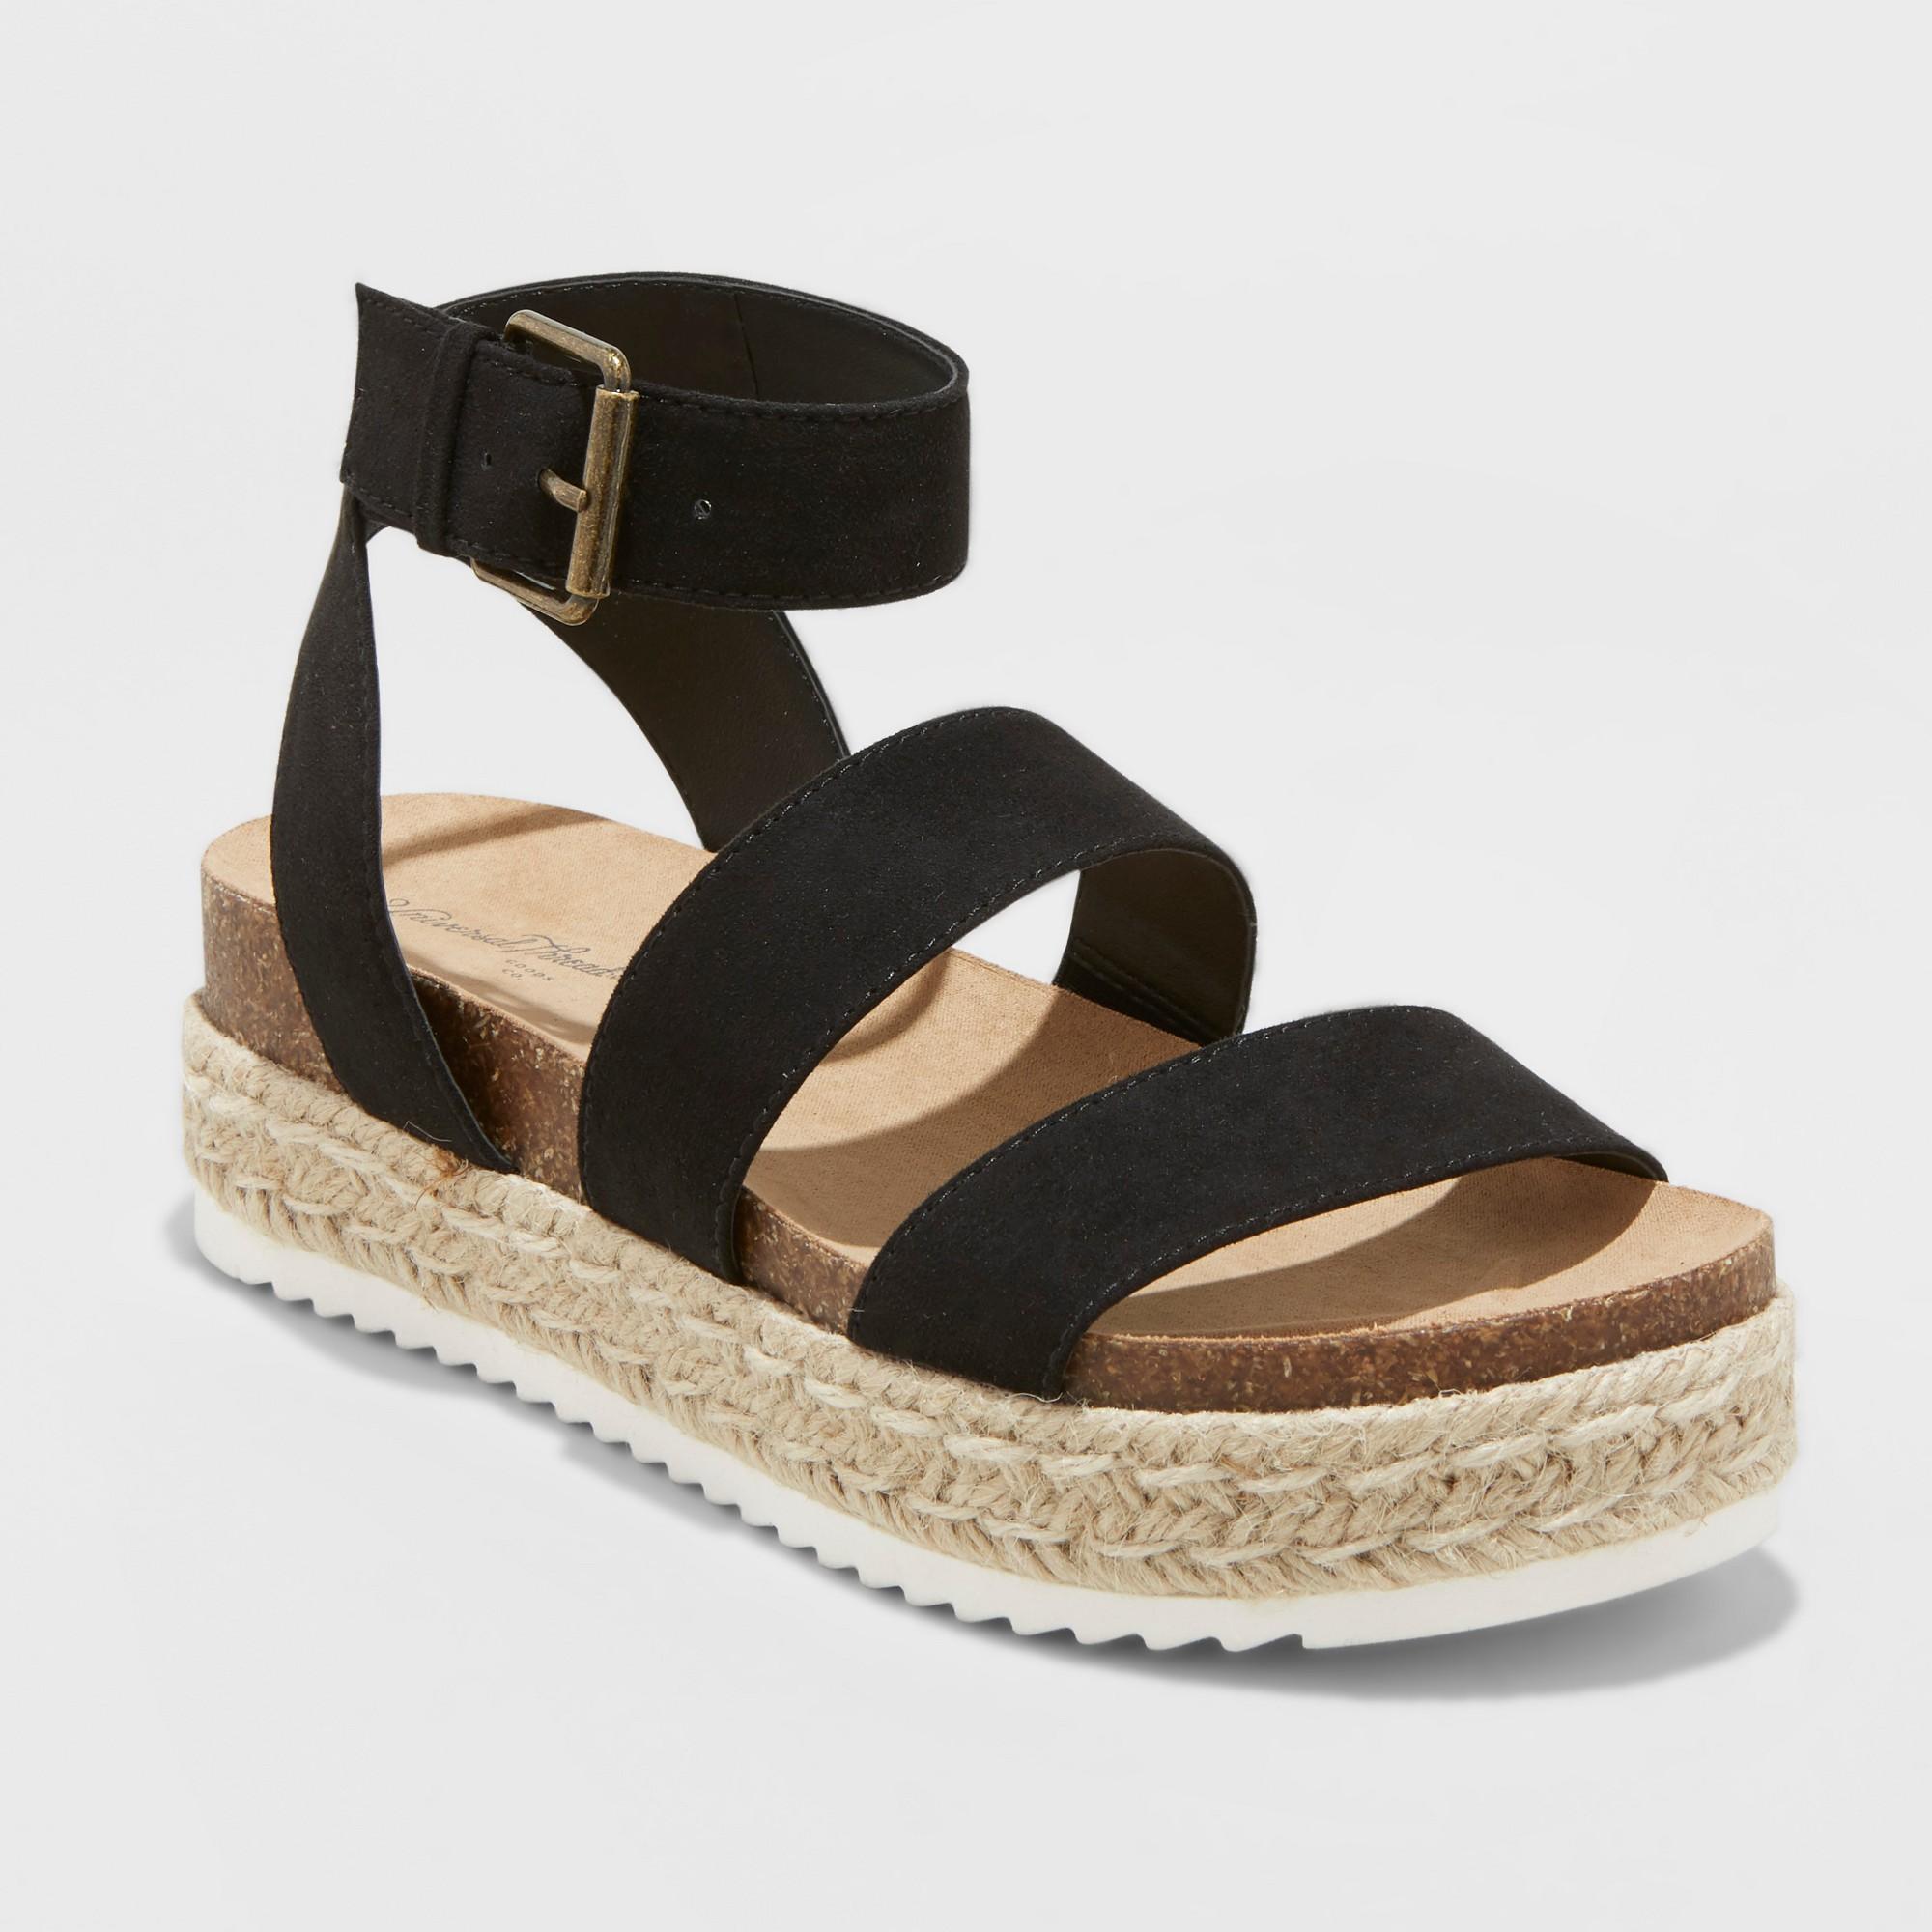 womens wide width platform sandals